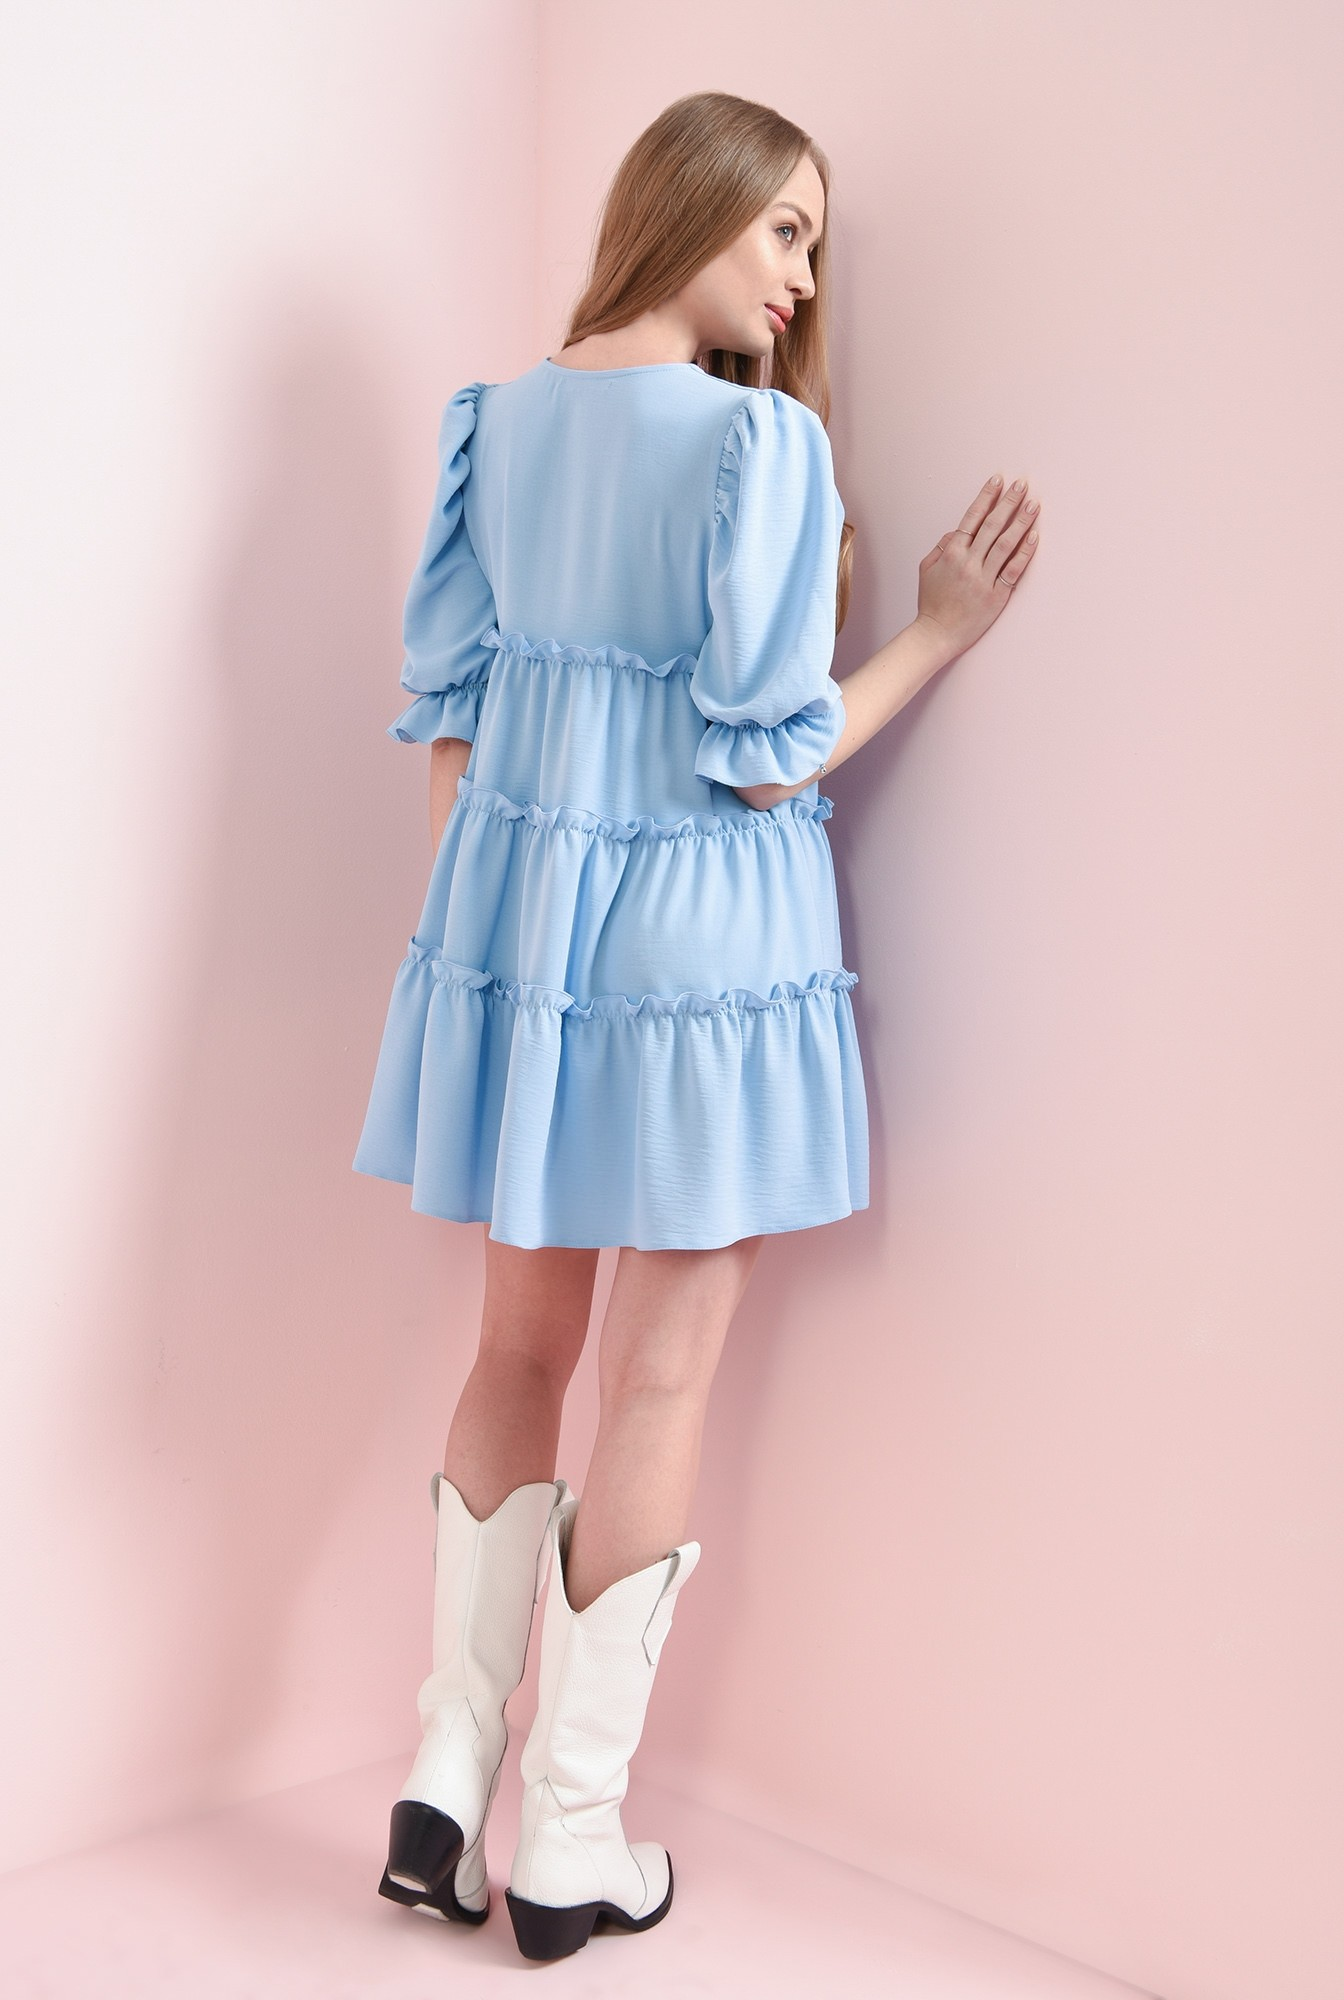 2 - rochie bleu, cu maneca voluminoasa